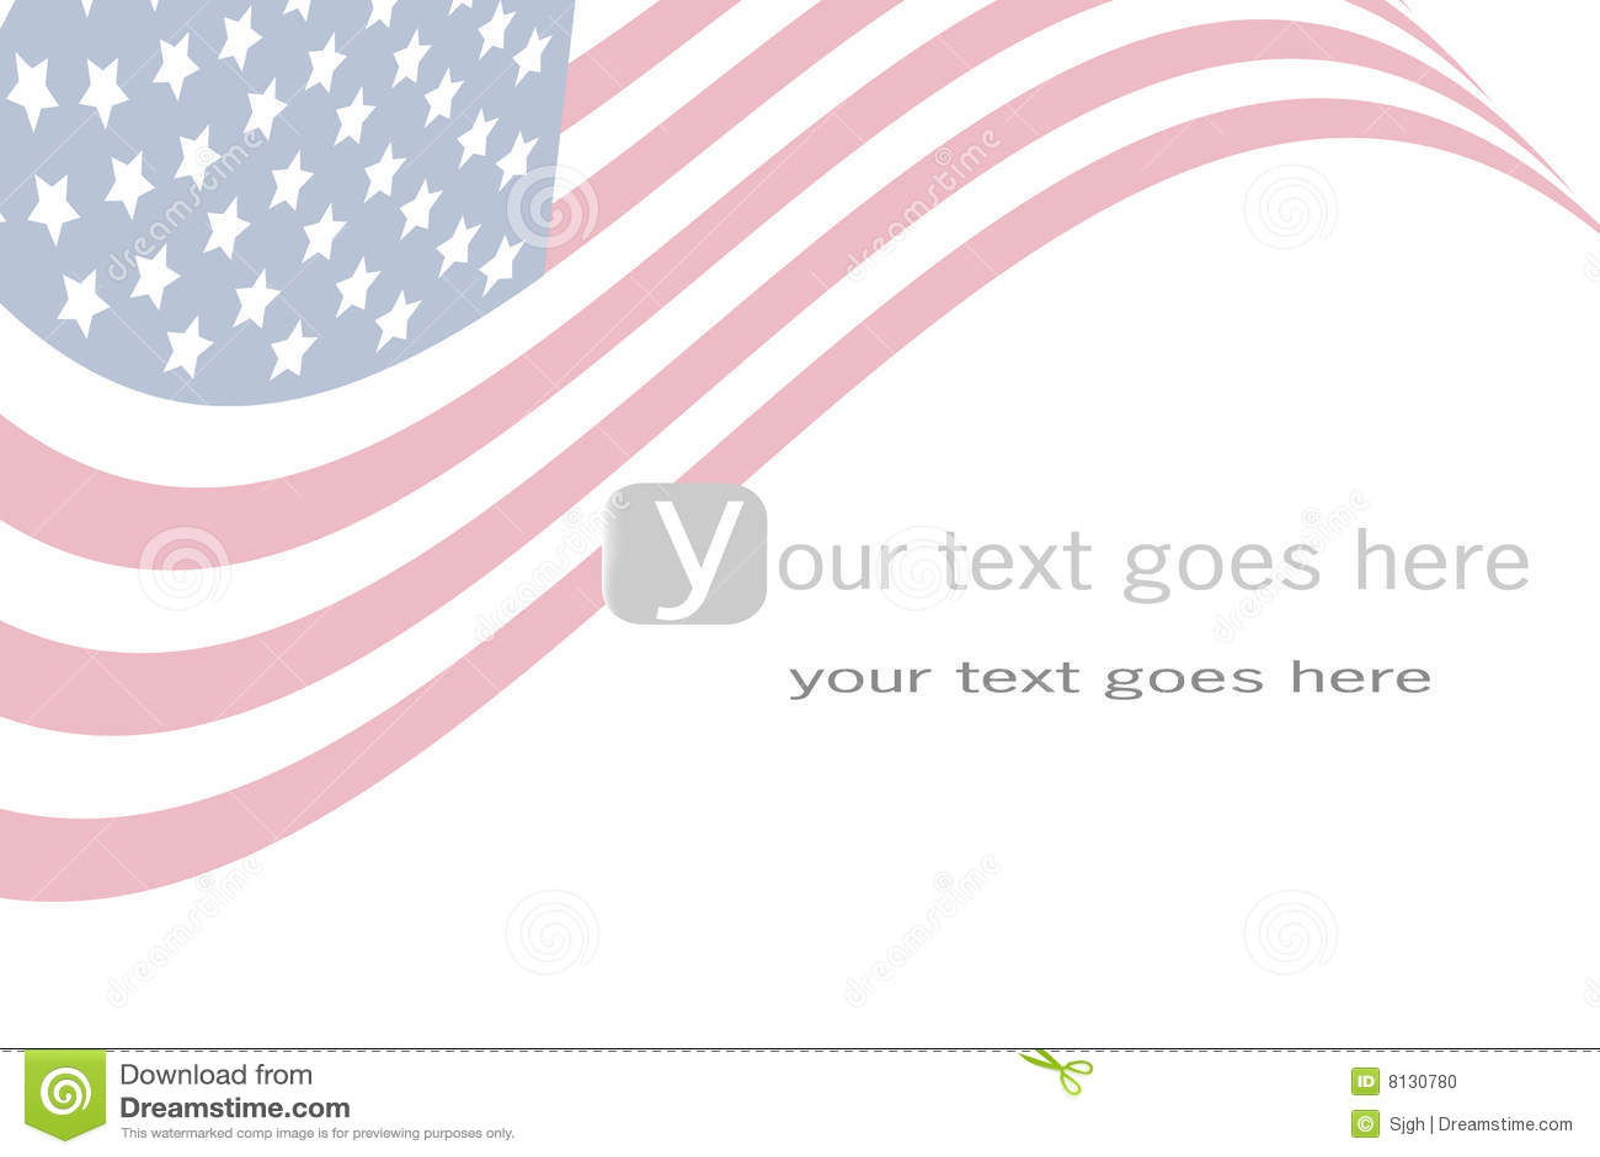 Us flag background stock vector  Illustration of patriotism - 8130780